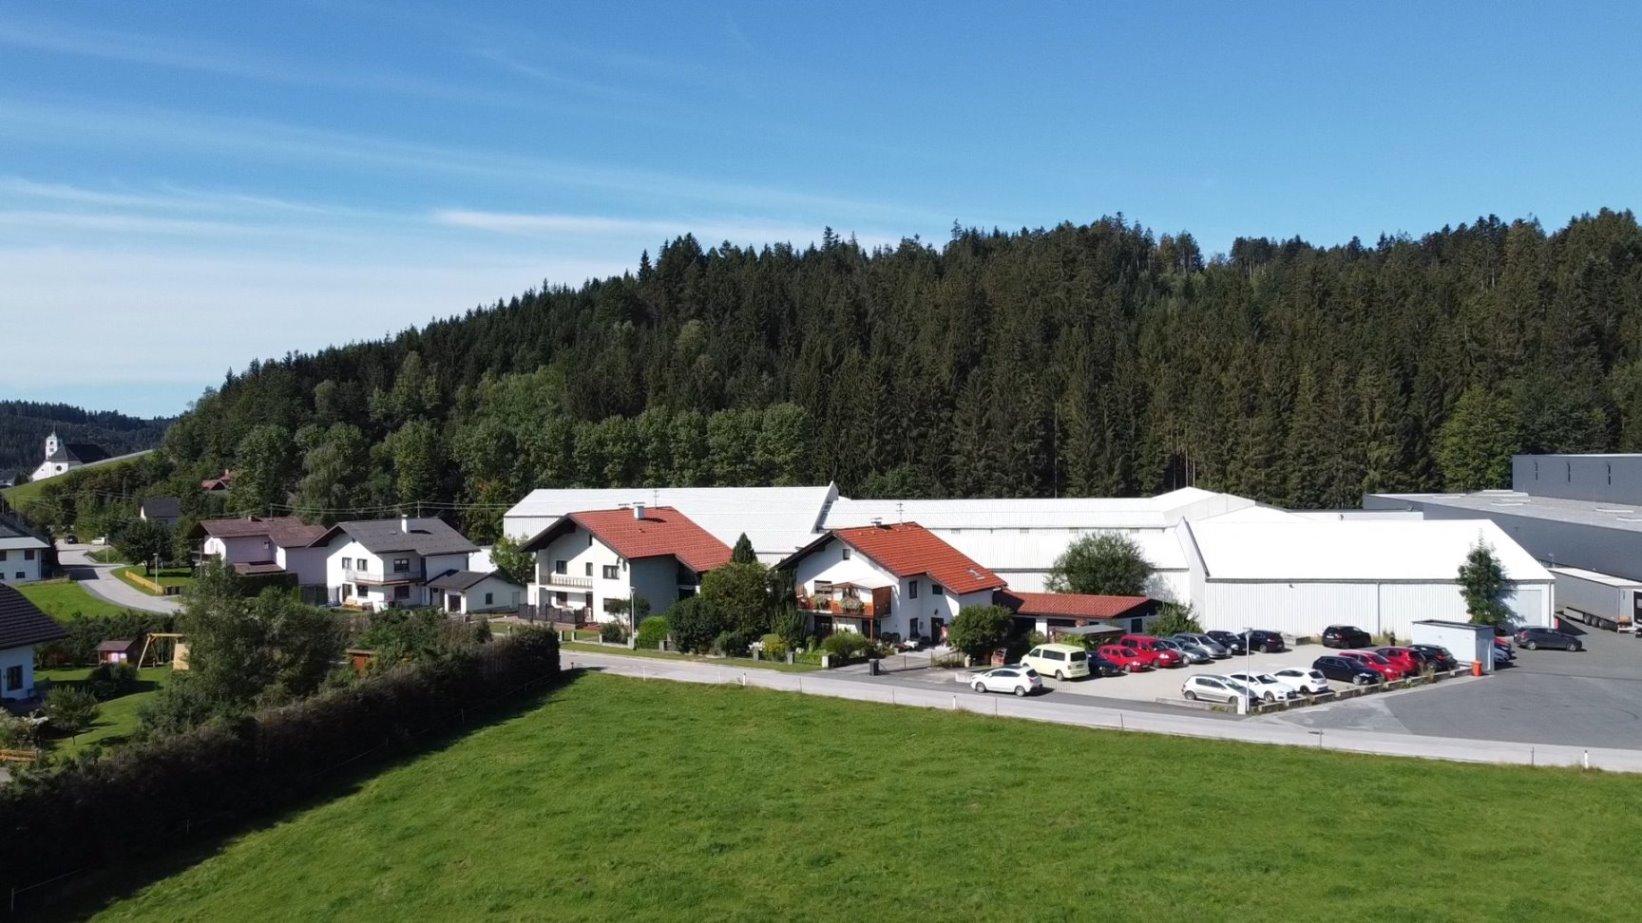 Ehemalige RIEDEL-Glashütte - heute Logistikzentrum